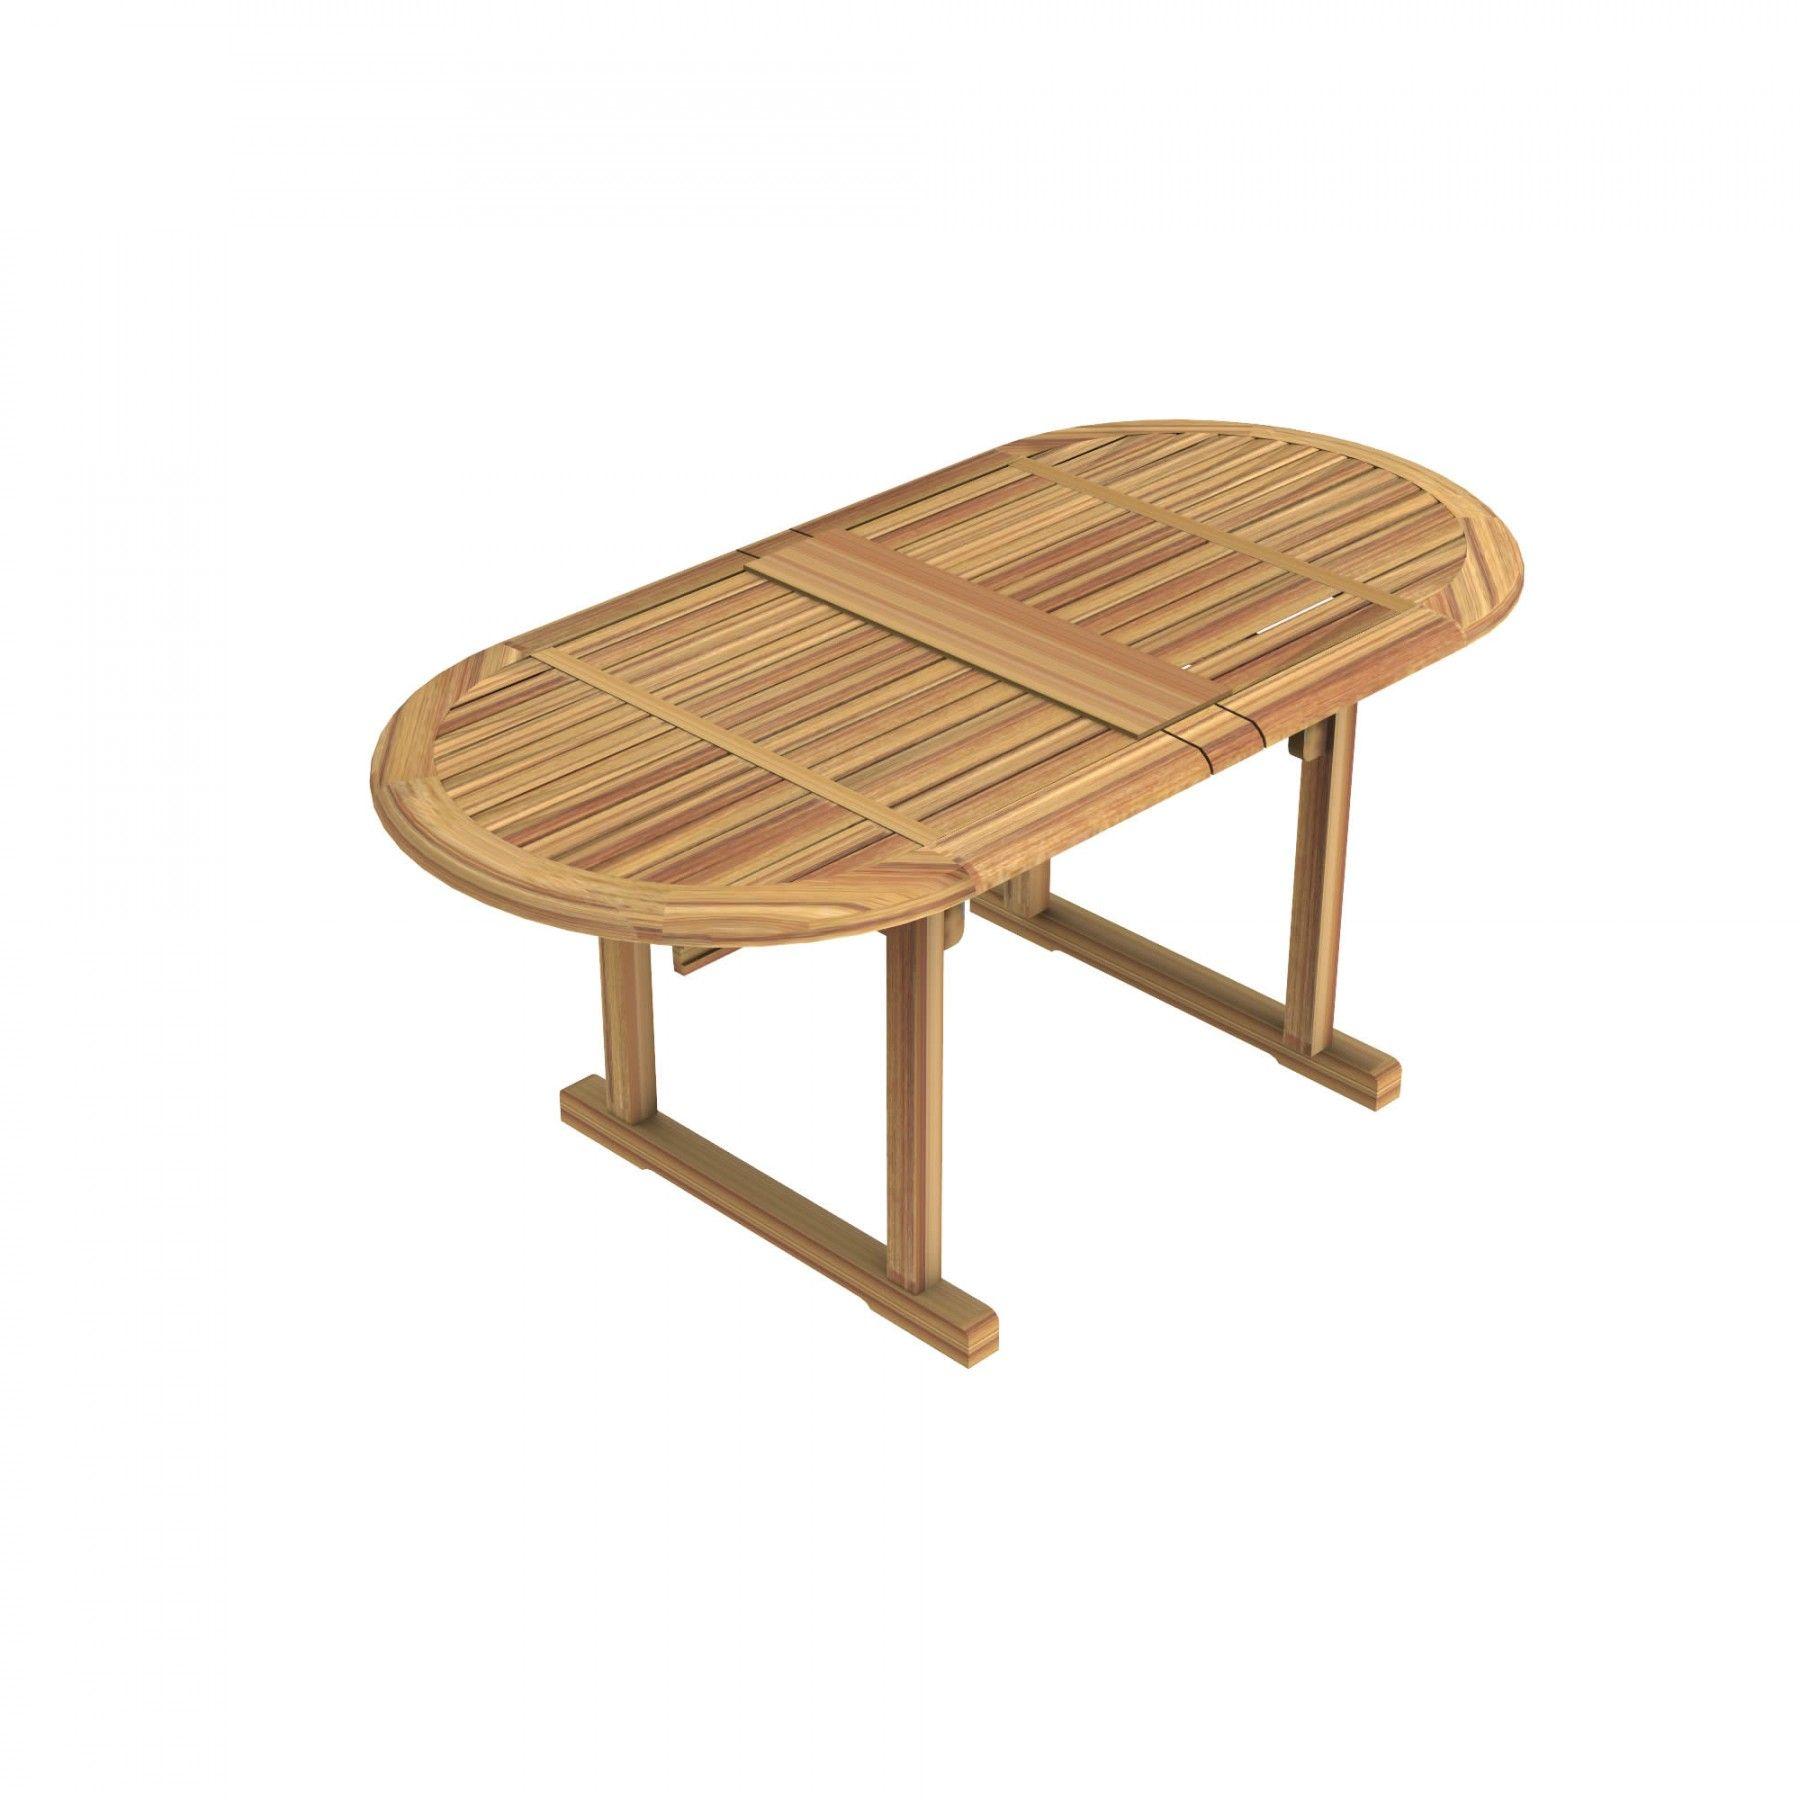 Table ovale de jardin Milton en Teck - Unopiù | Salle à manger ...